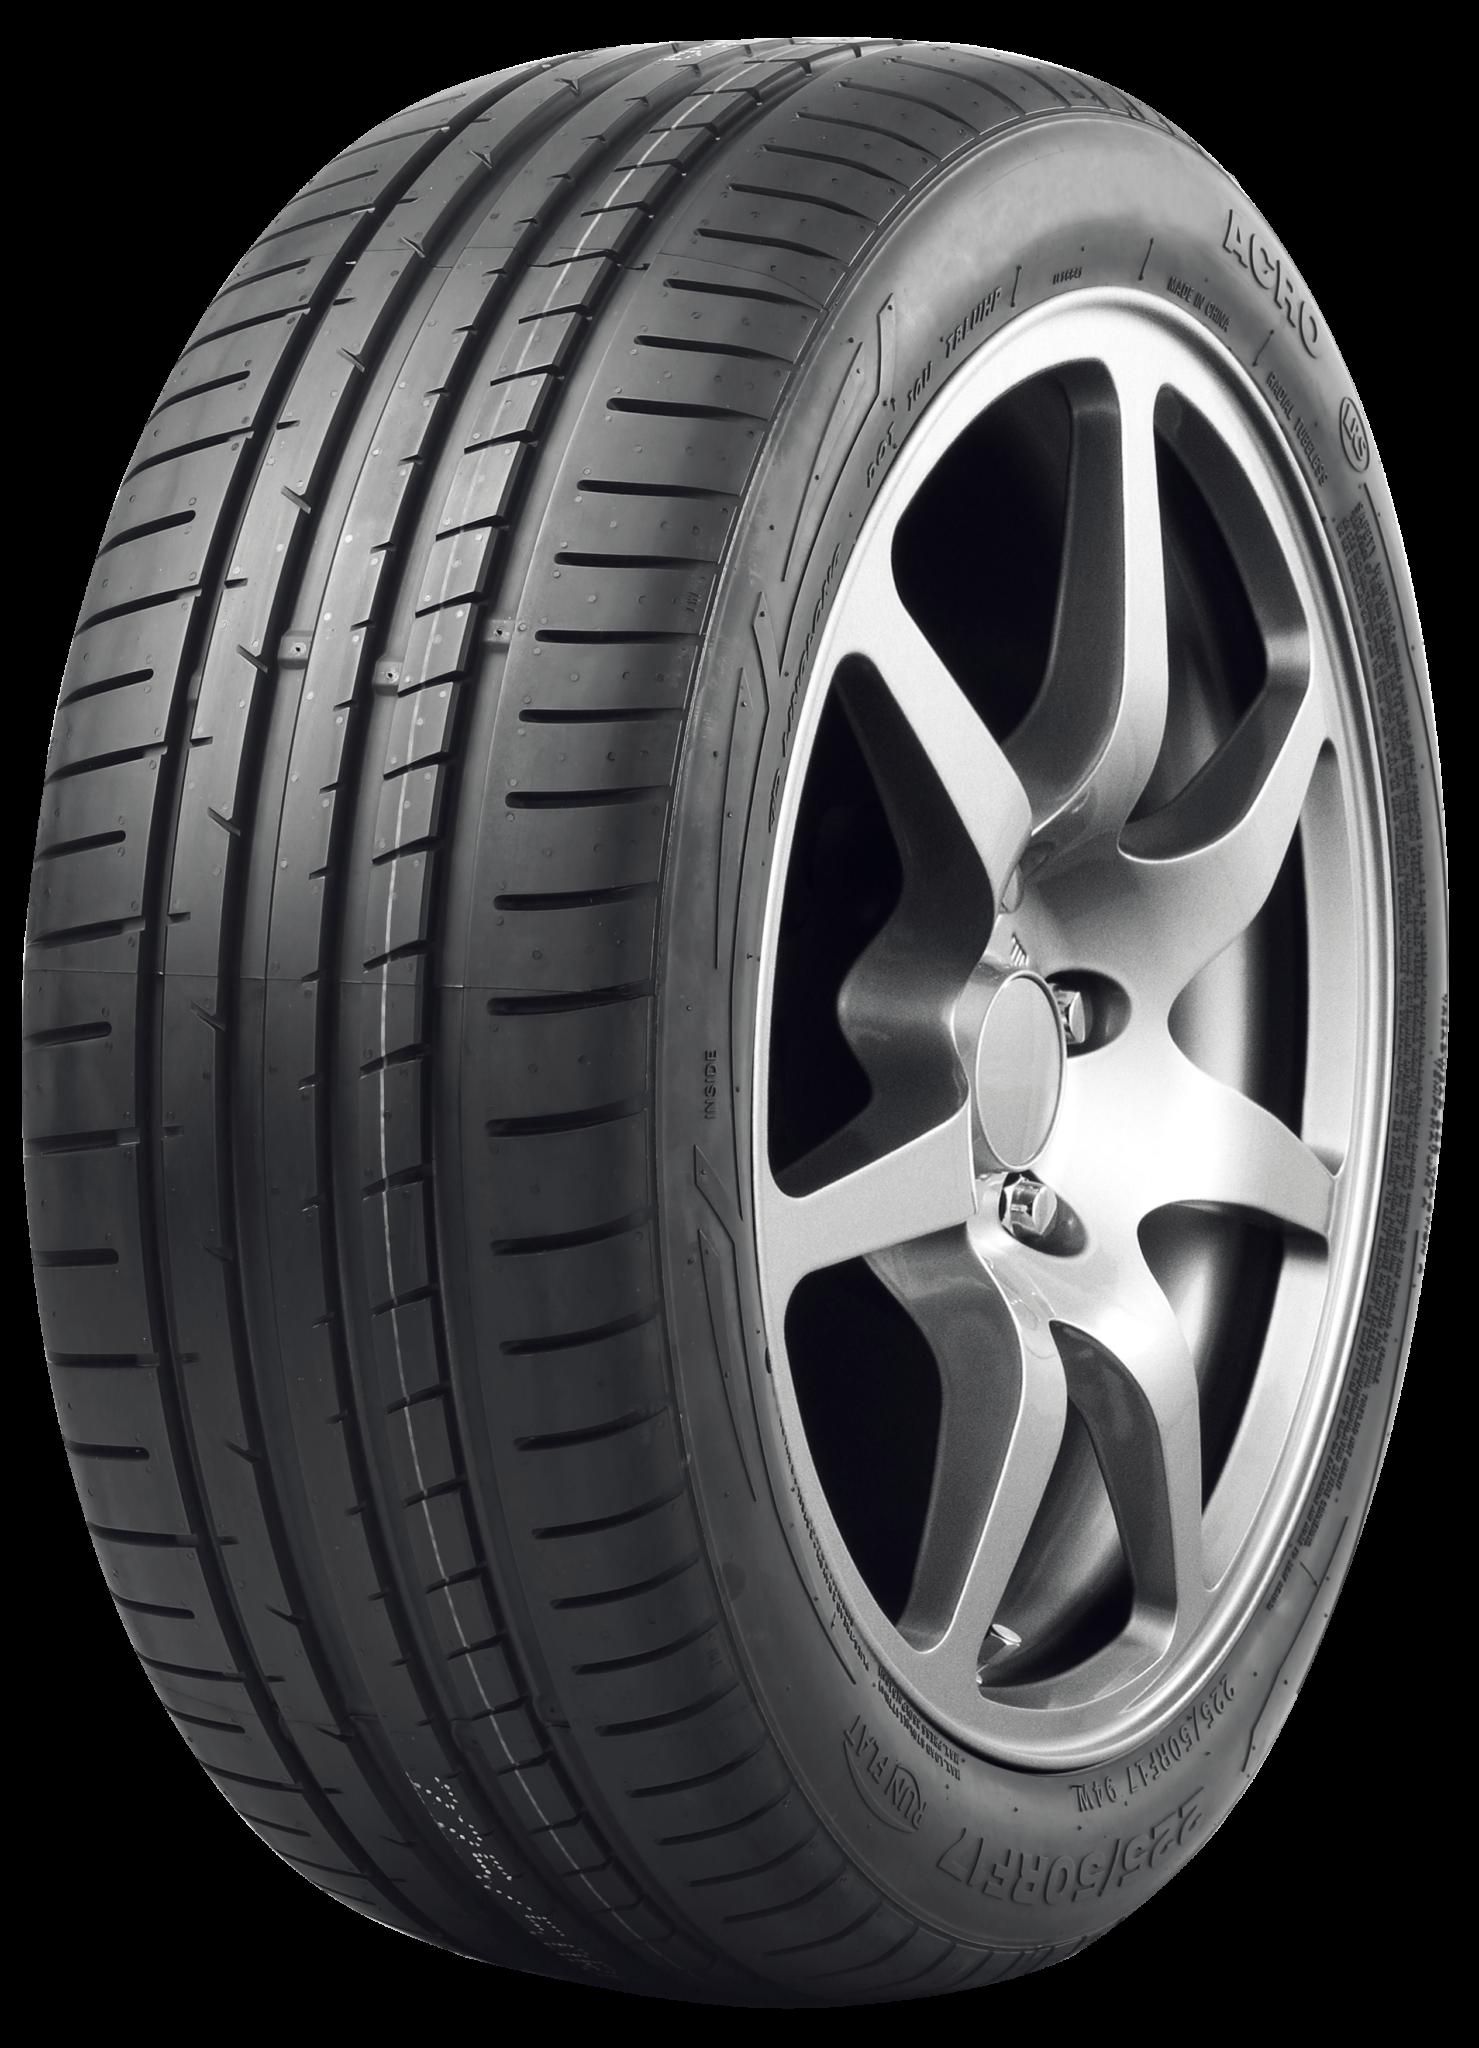 Linglong adds Nova Force Acro UHP tyre to Leao brand range